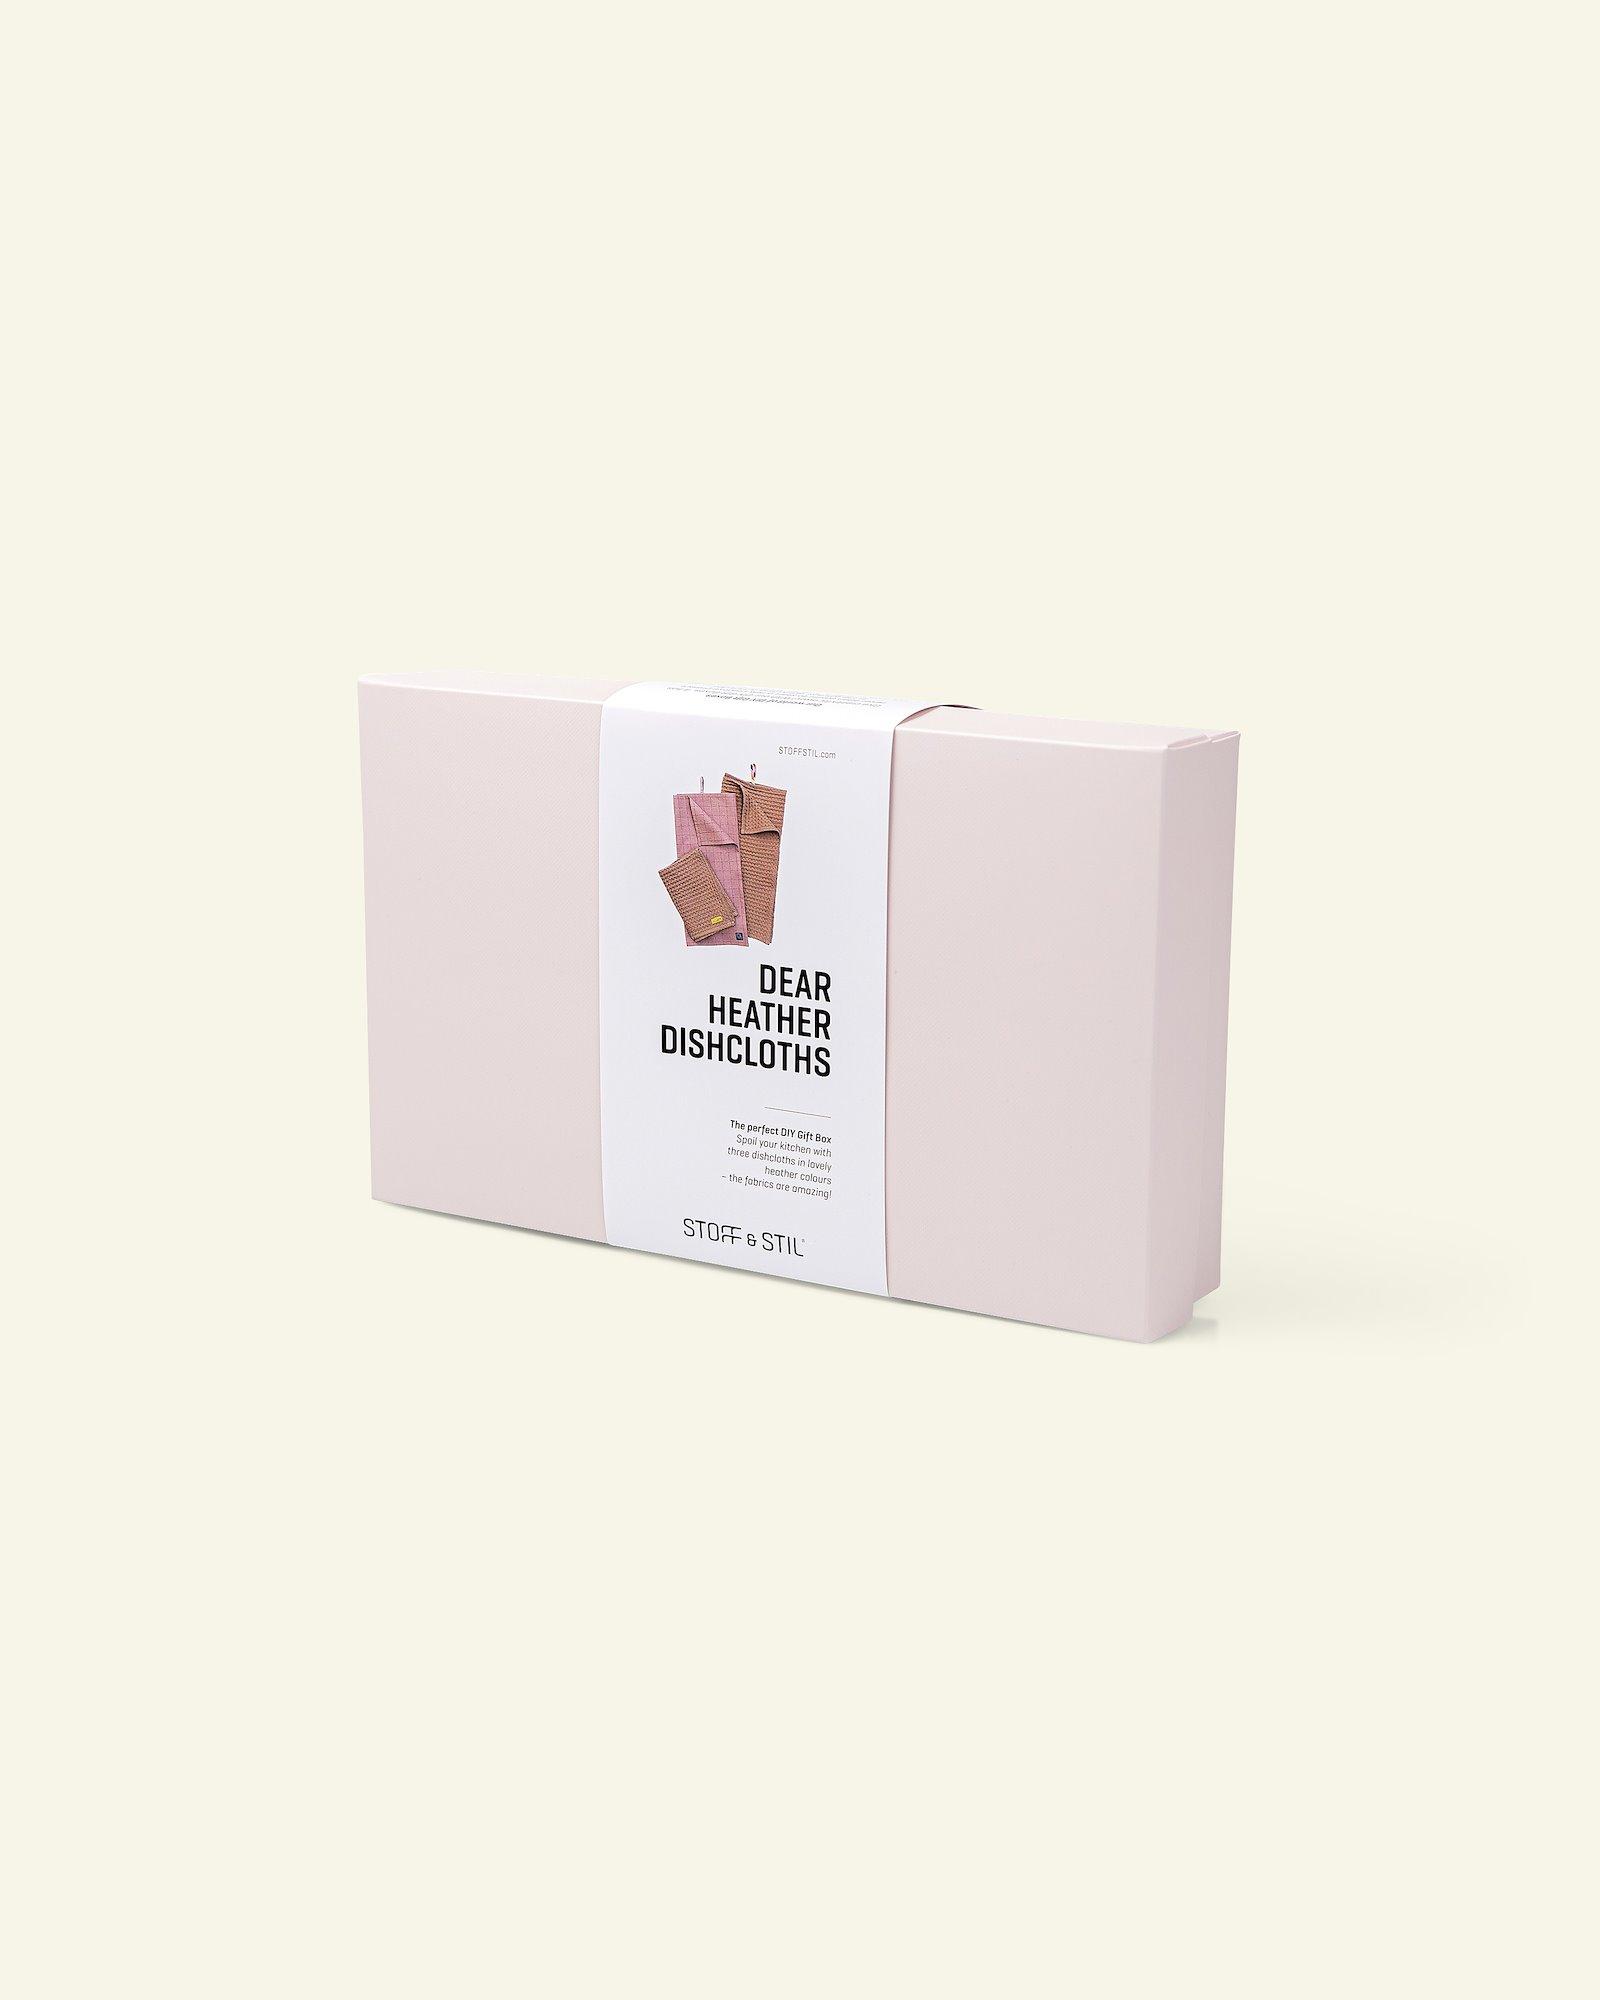 DIY Gift Box dishtowels